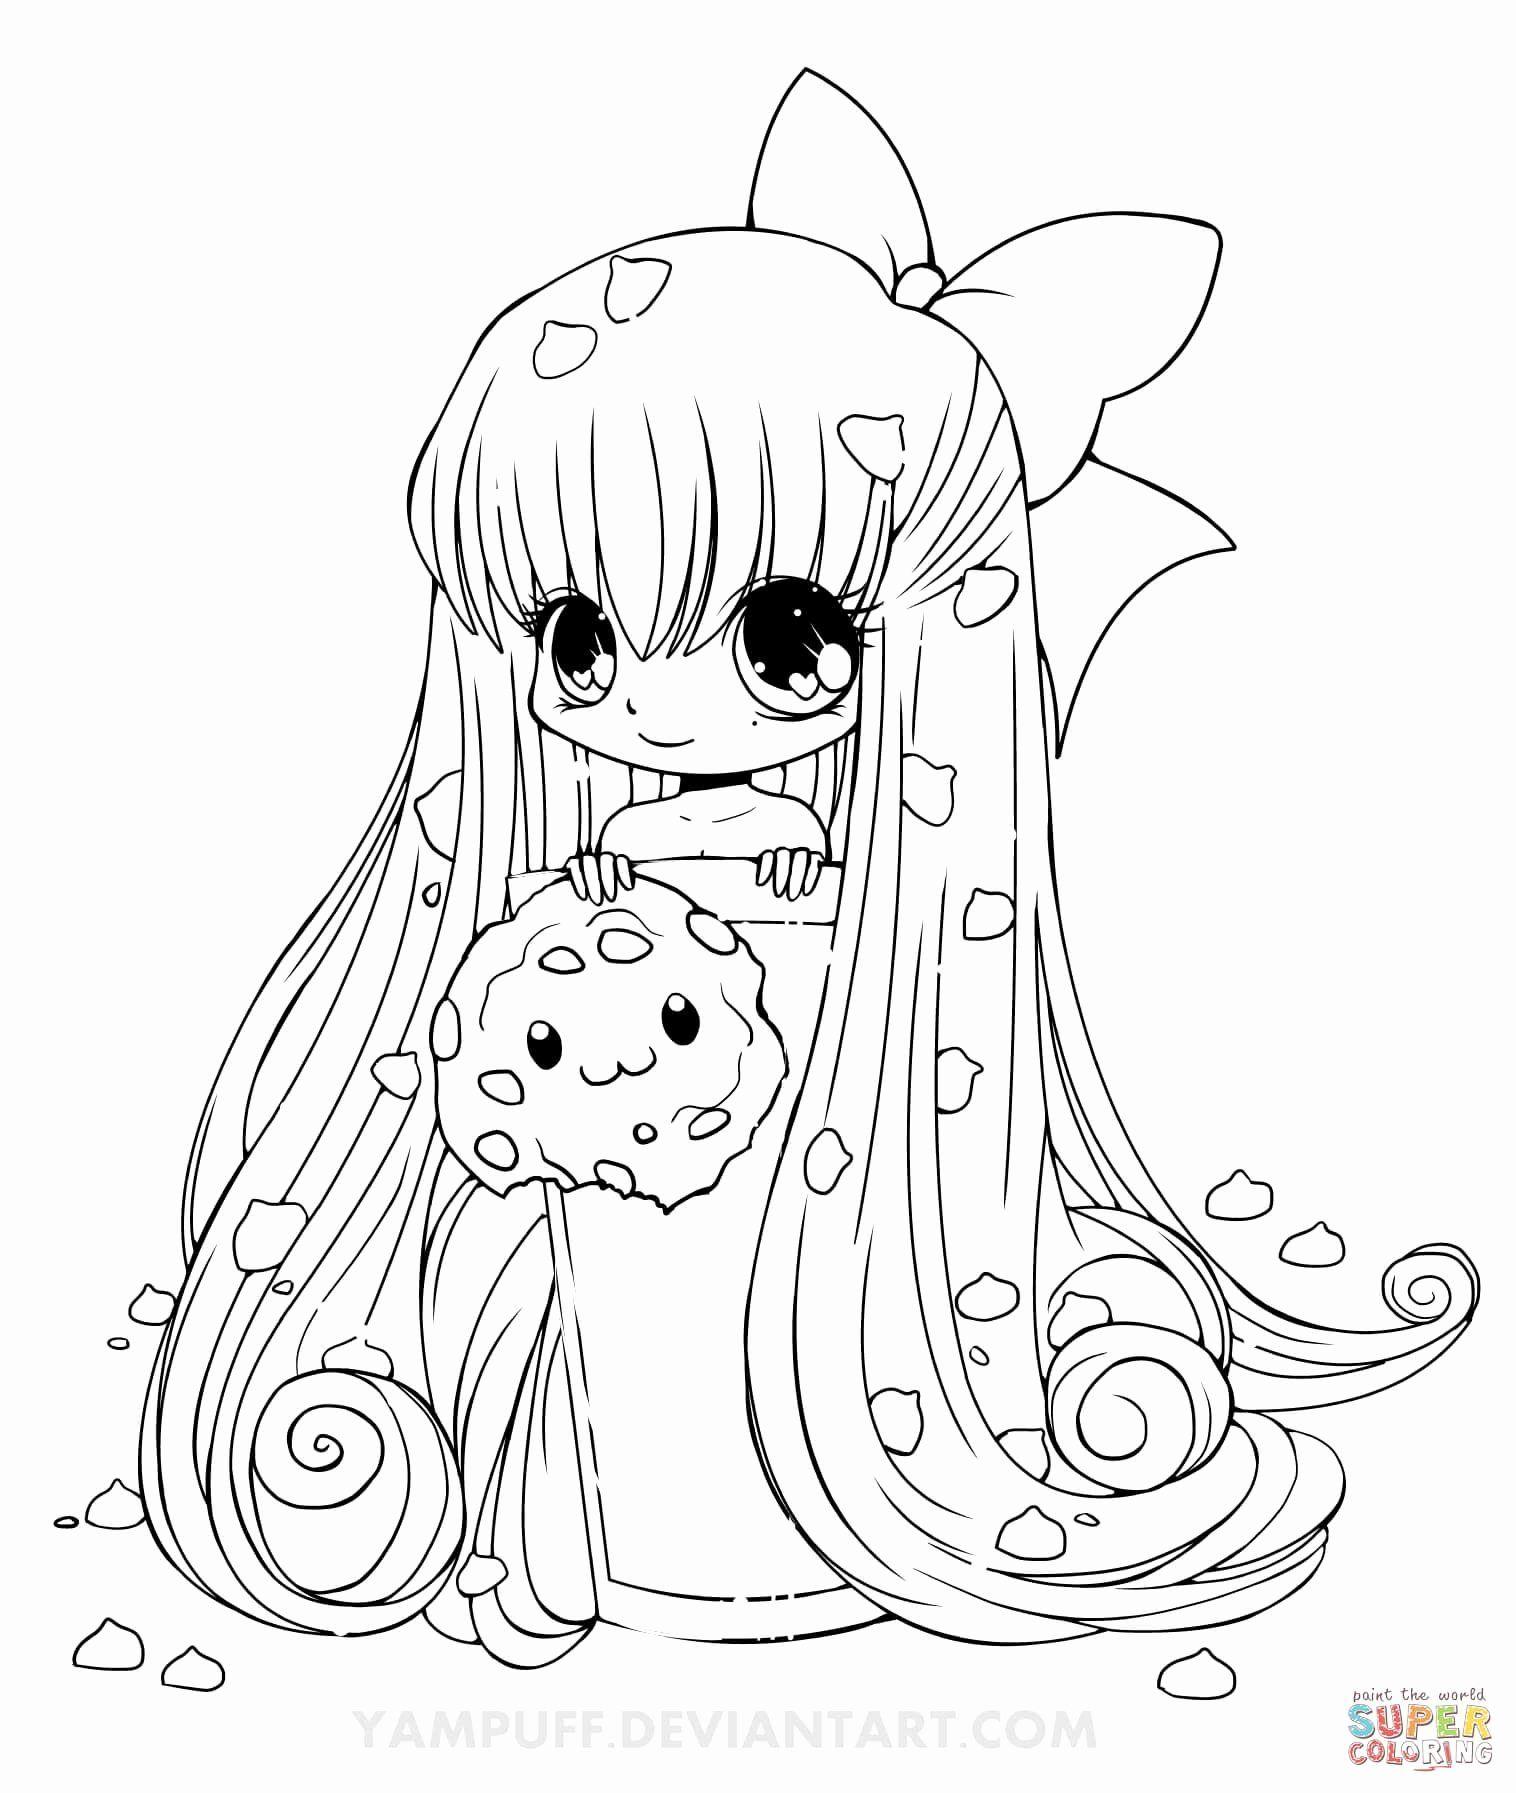 Anime Coloring Food Beautiful Cookie Girl Coloring Pages Chibi Coloring Pages Cute Coloring Pages Animal Coloring Pages